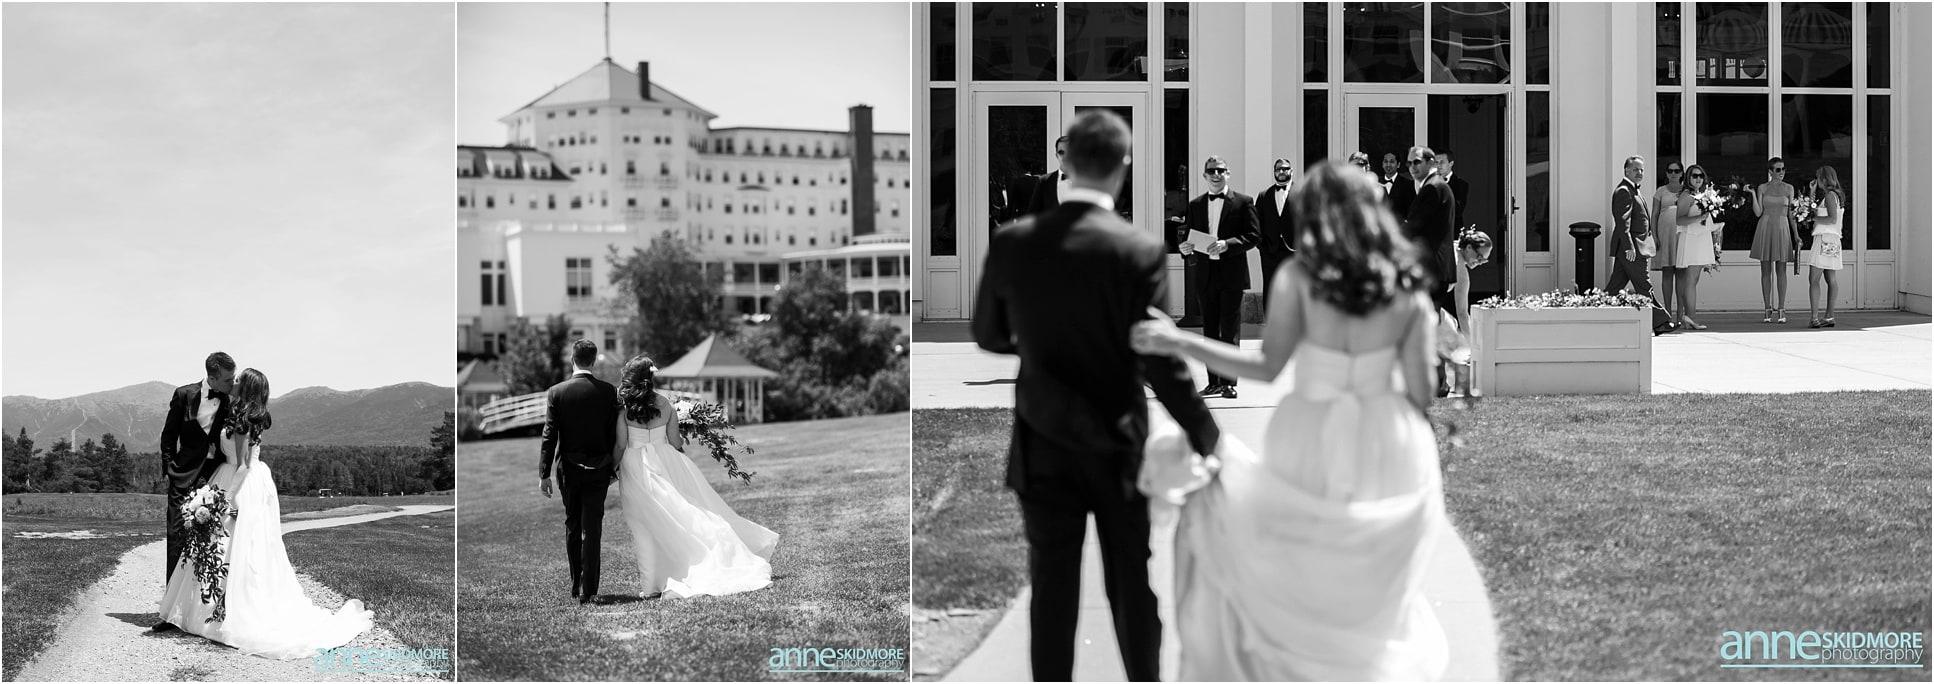 Omni_Mount_Washington_Wedding_0018